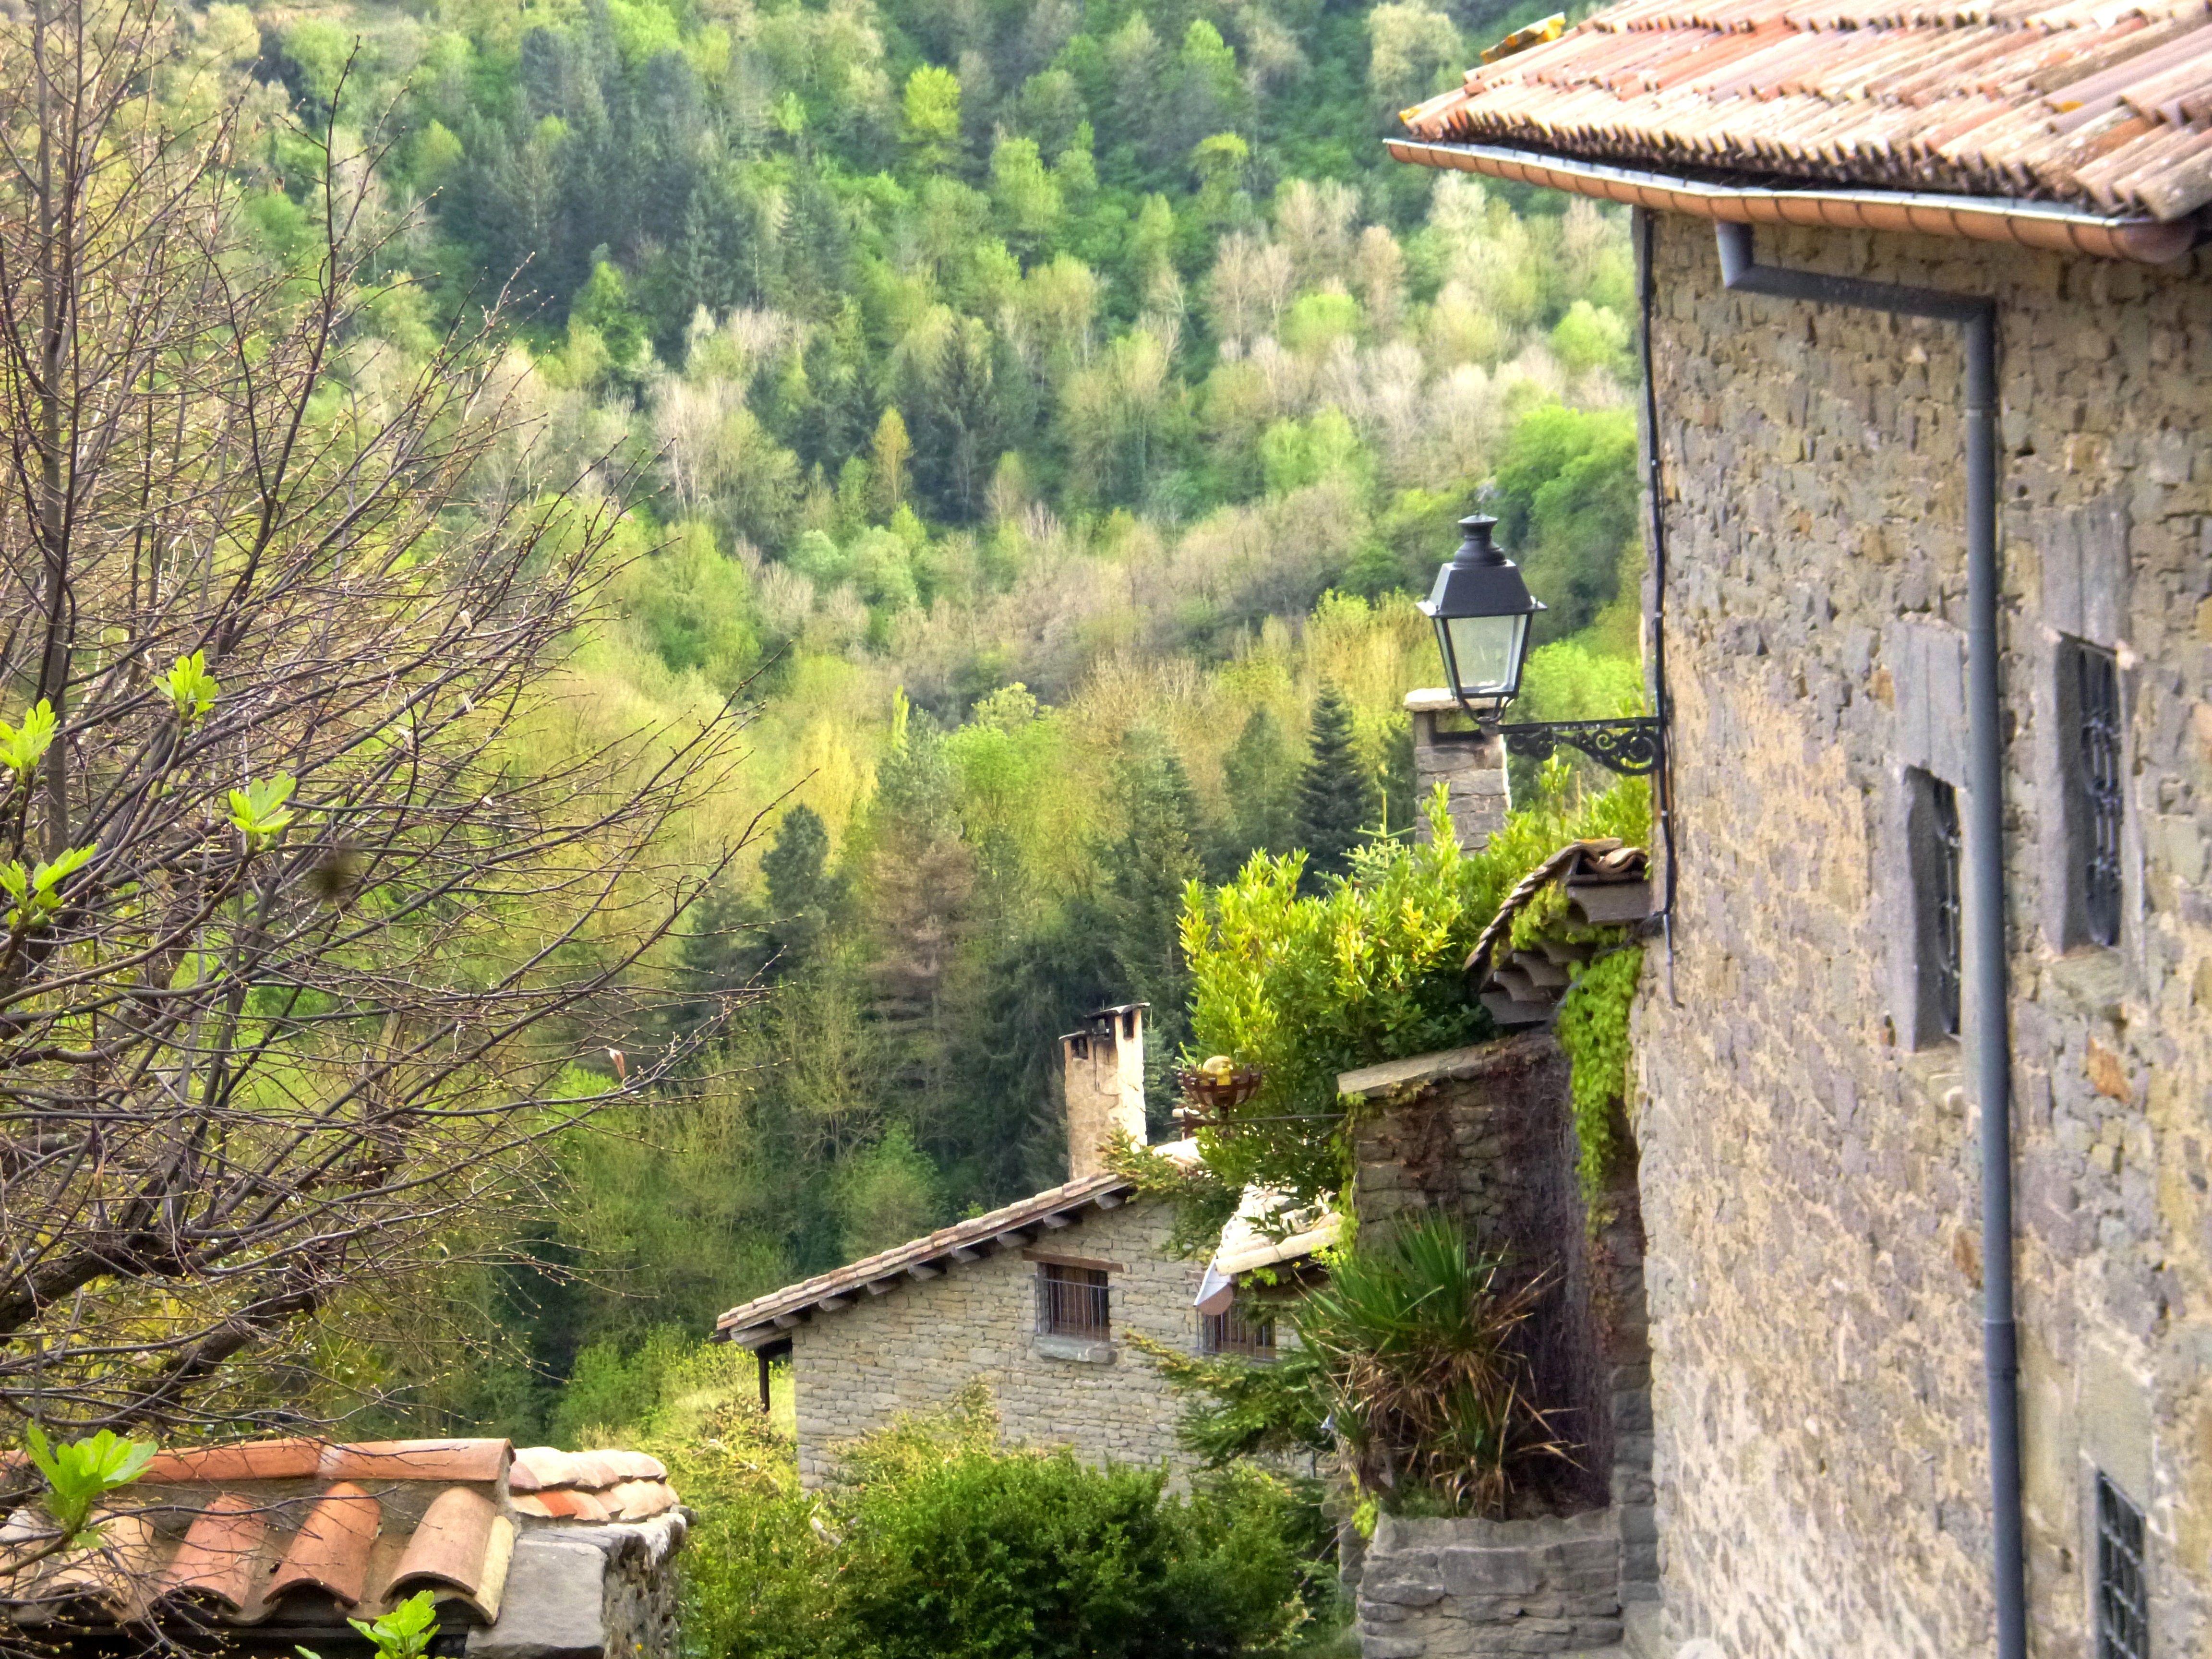 Неизведанная Каталония: Santuari del Far и Rupit (Рупит)